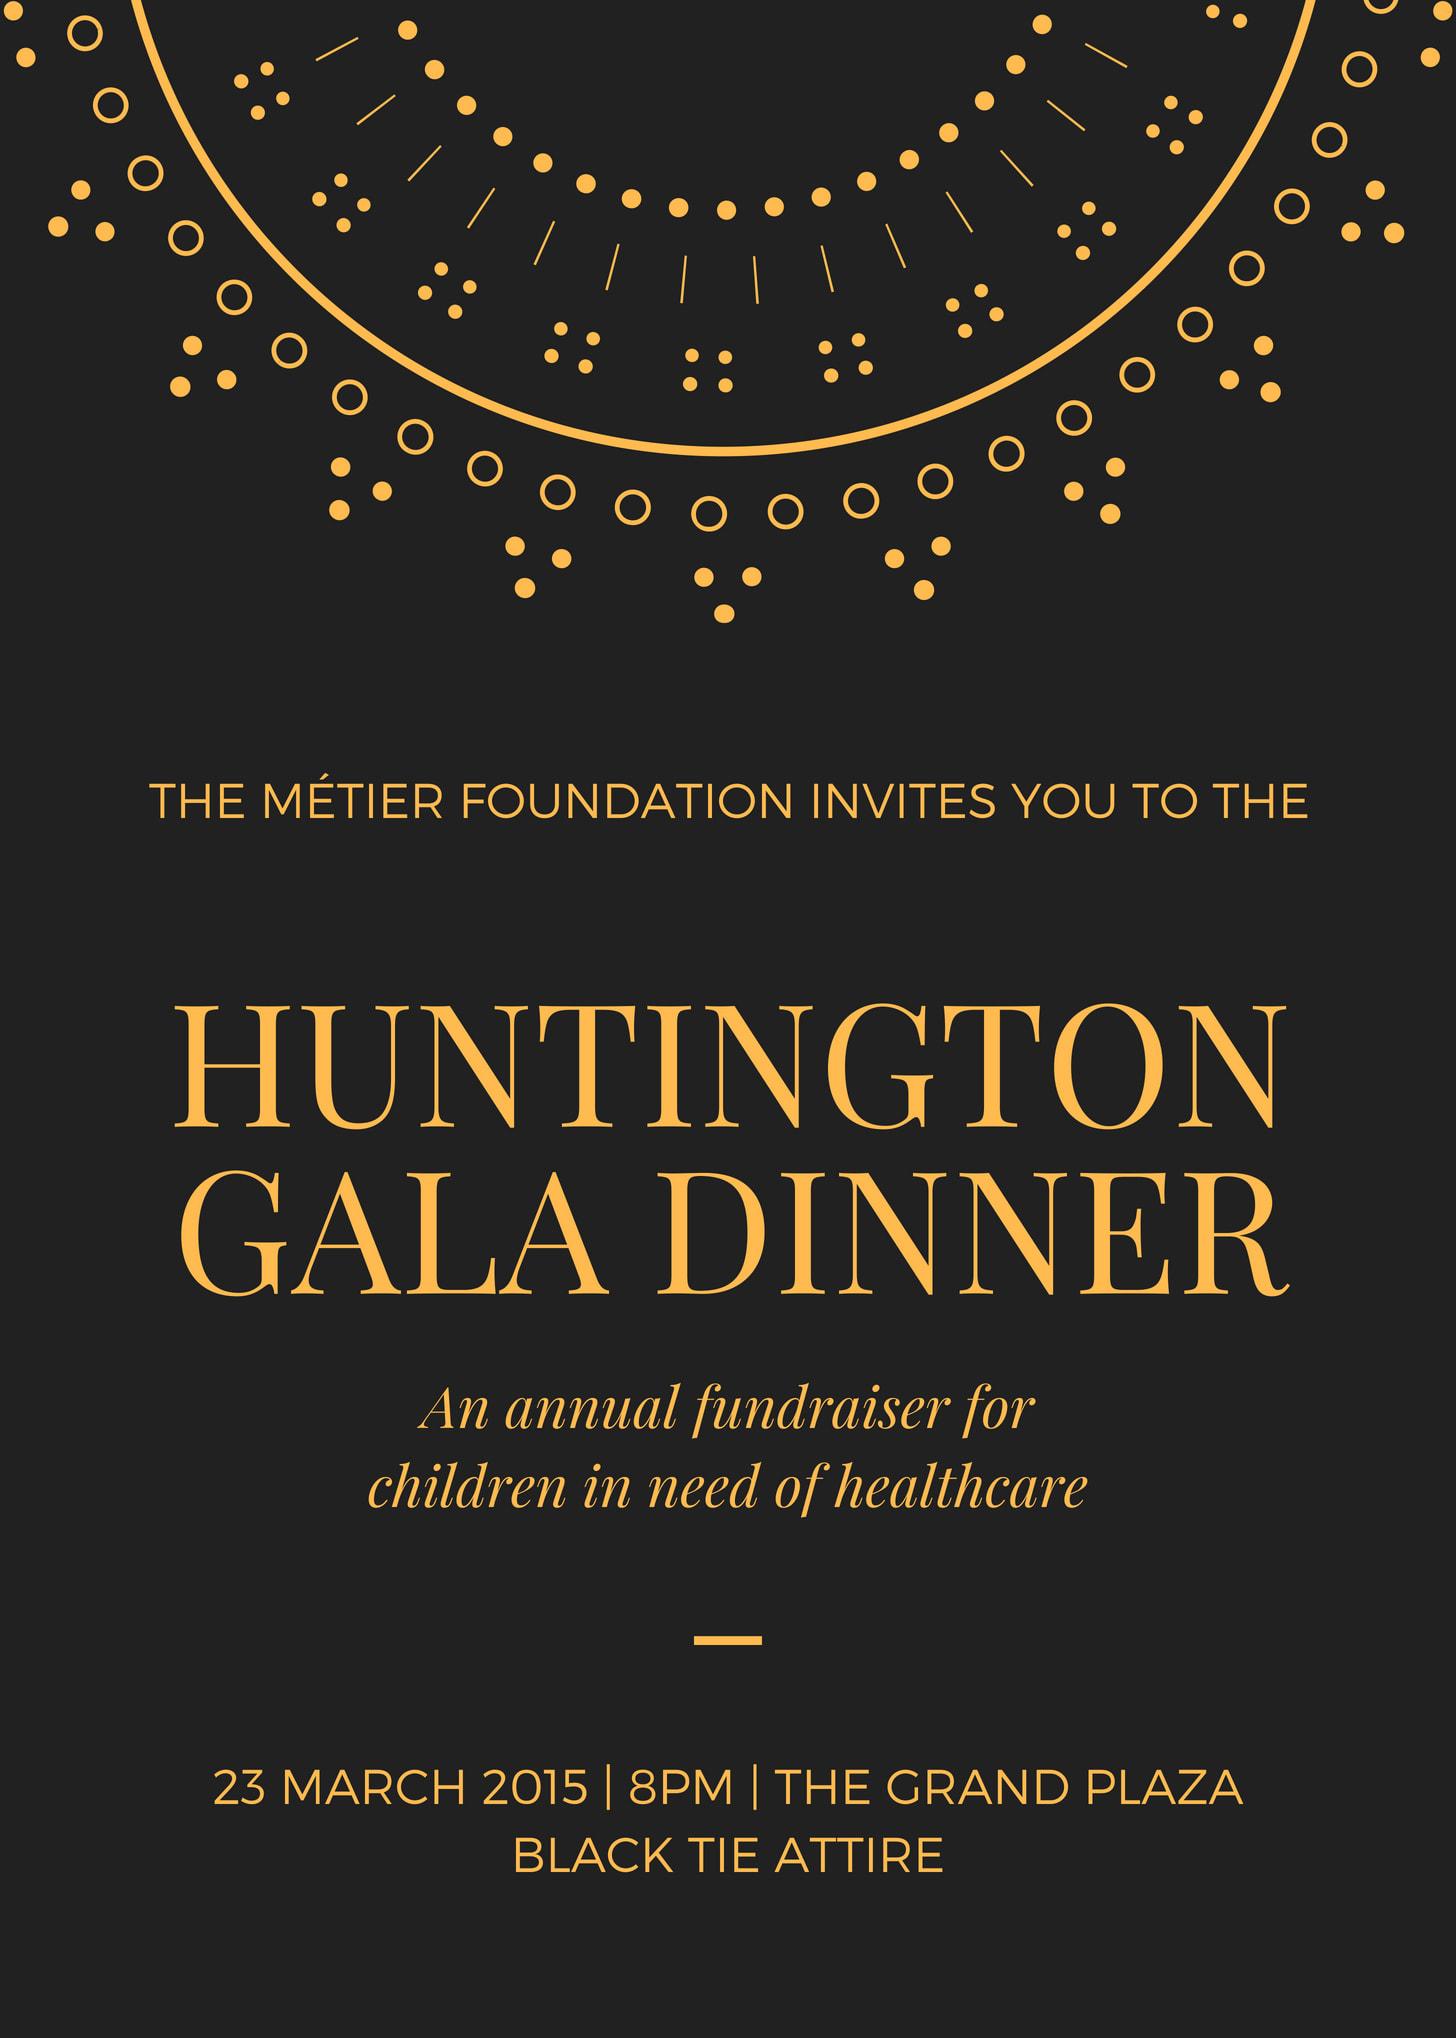 Huntington Gala Dinner